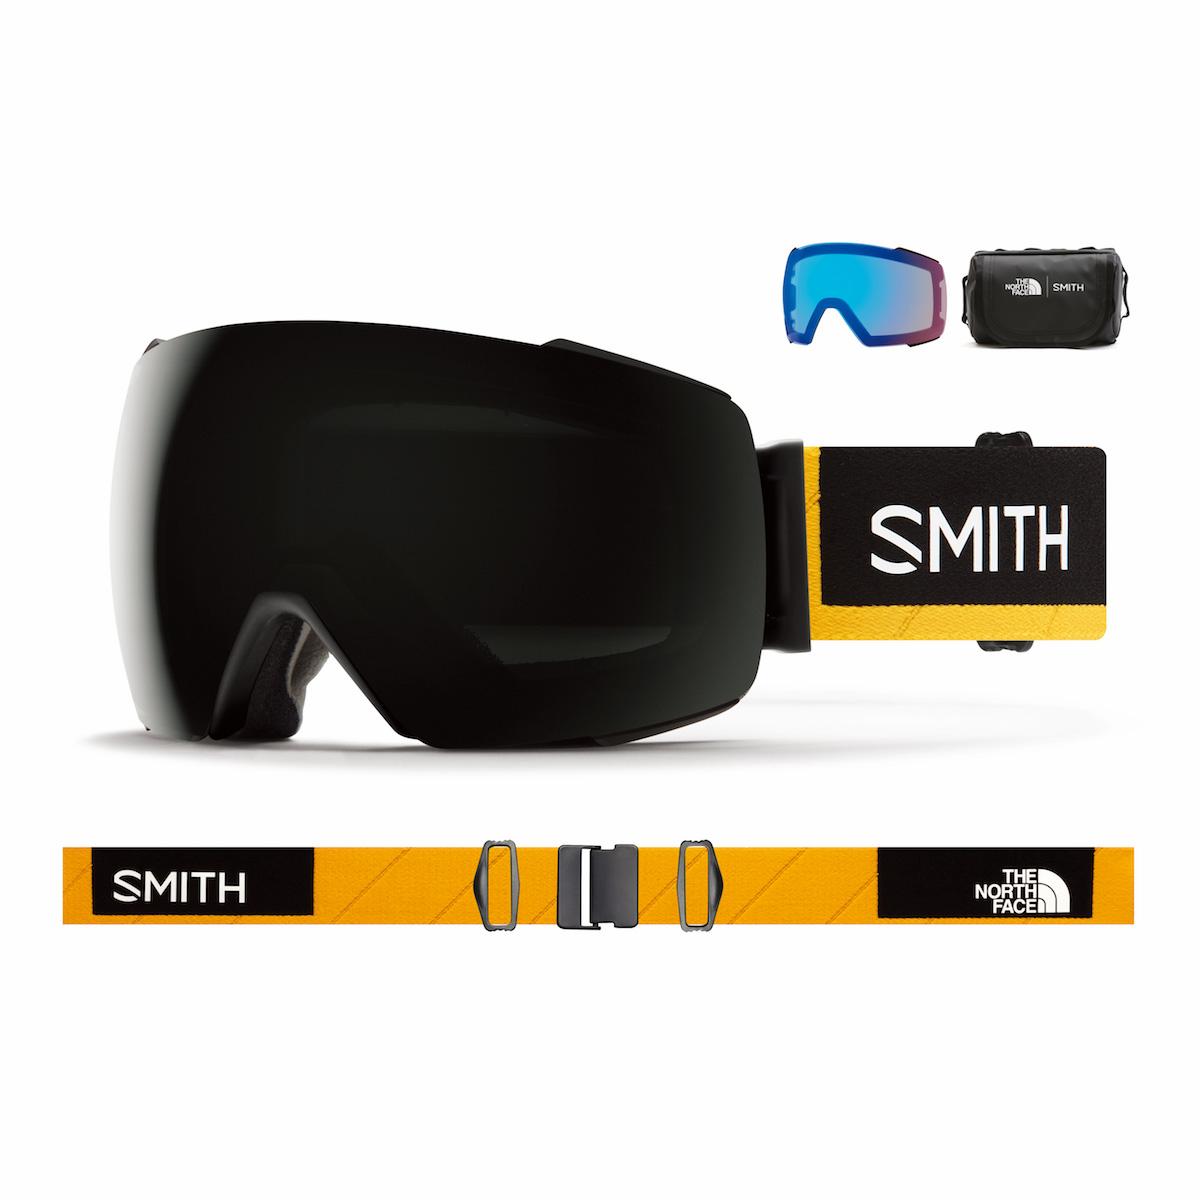 SMITH I/O MAG AC AustinSmith CP-SunBlack SMITH x THENORTHFACE ノースフェイス スミス アイオーマグ 数量限定 ノースフェイスコラボモデル